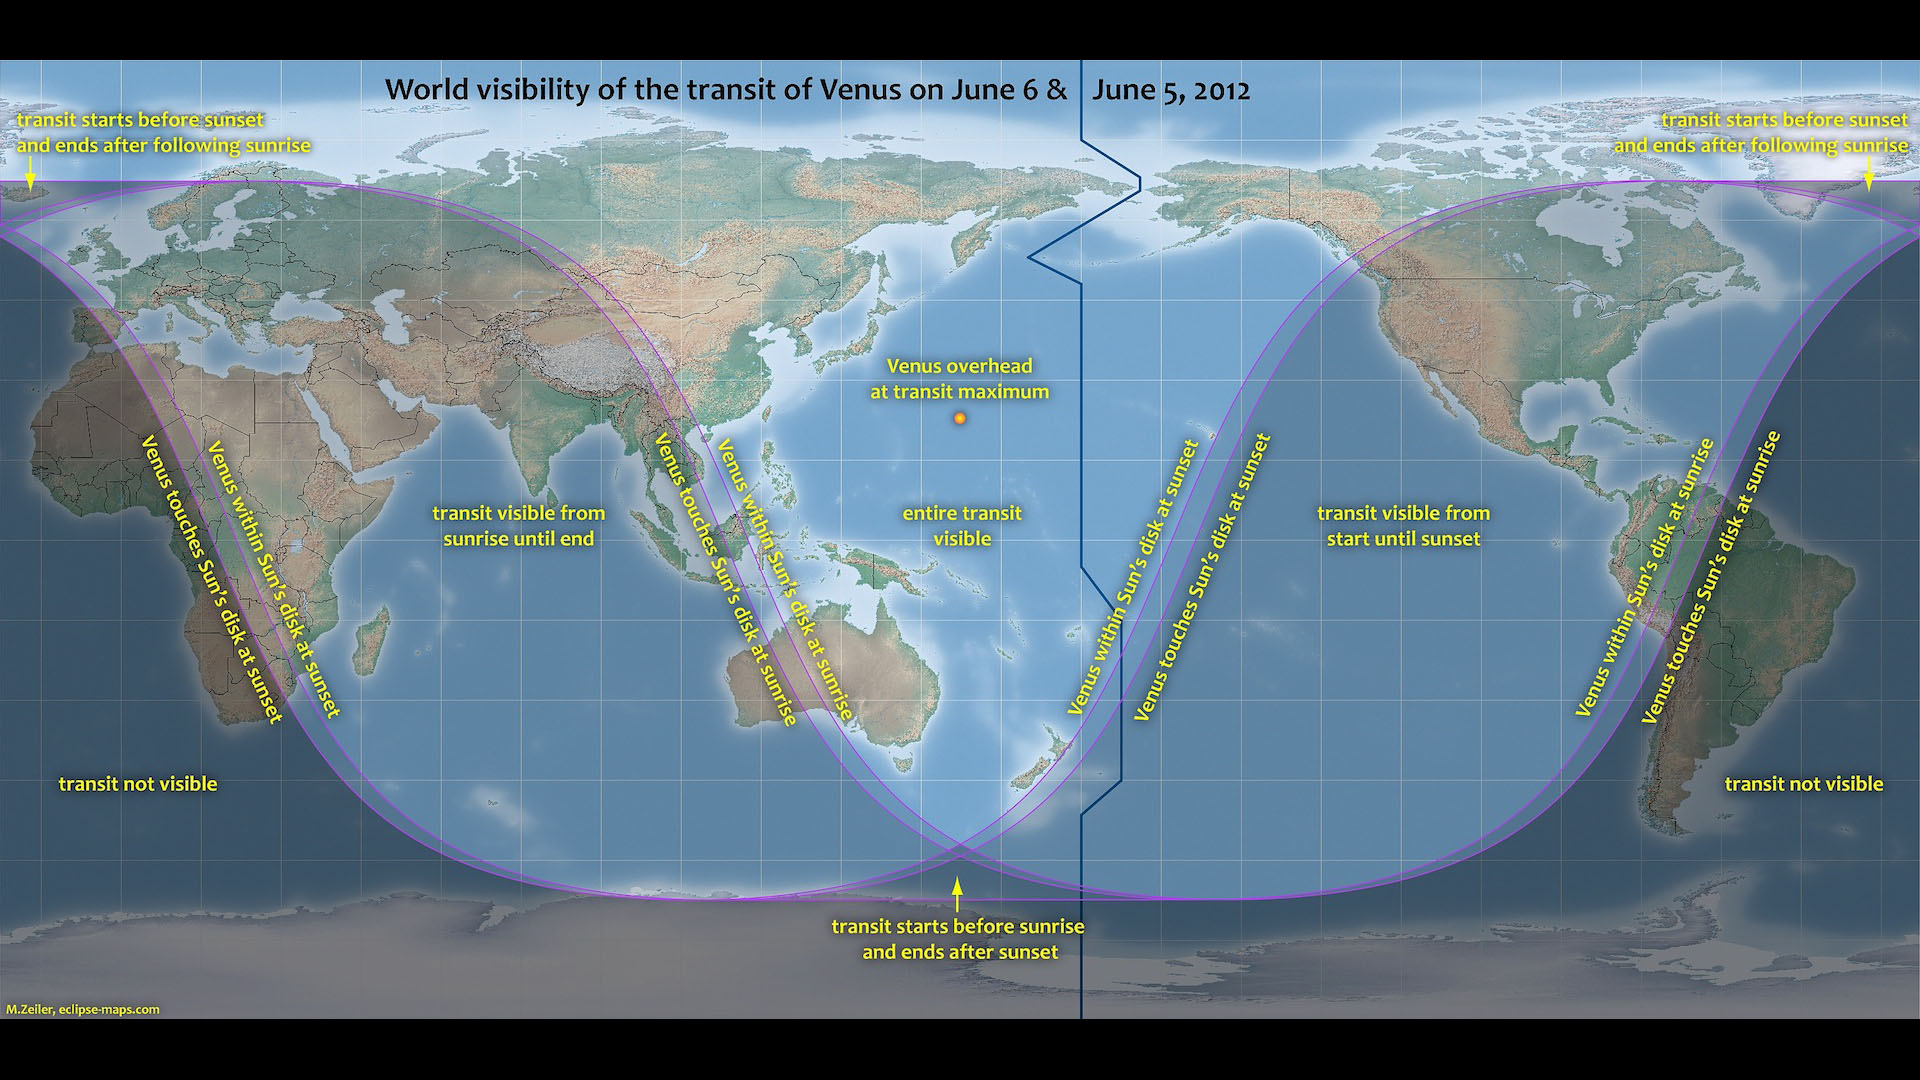 NASA Viz: Venus Transit Venus Ocean Map on gorilla map, gypsy map, global topographical map, ganymede map, uranus map, neptune map, milky way map, mercury map, space colonization map, saturn map, earth map, io map, mars map, ceres map, jupiter map, brazilia map, pleiades map, pluto map, iran map, moon map,